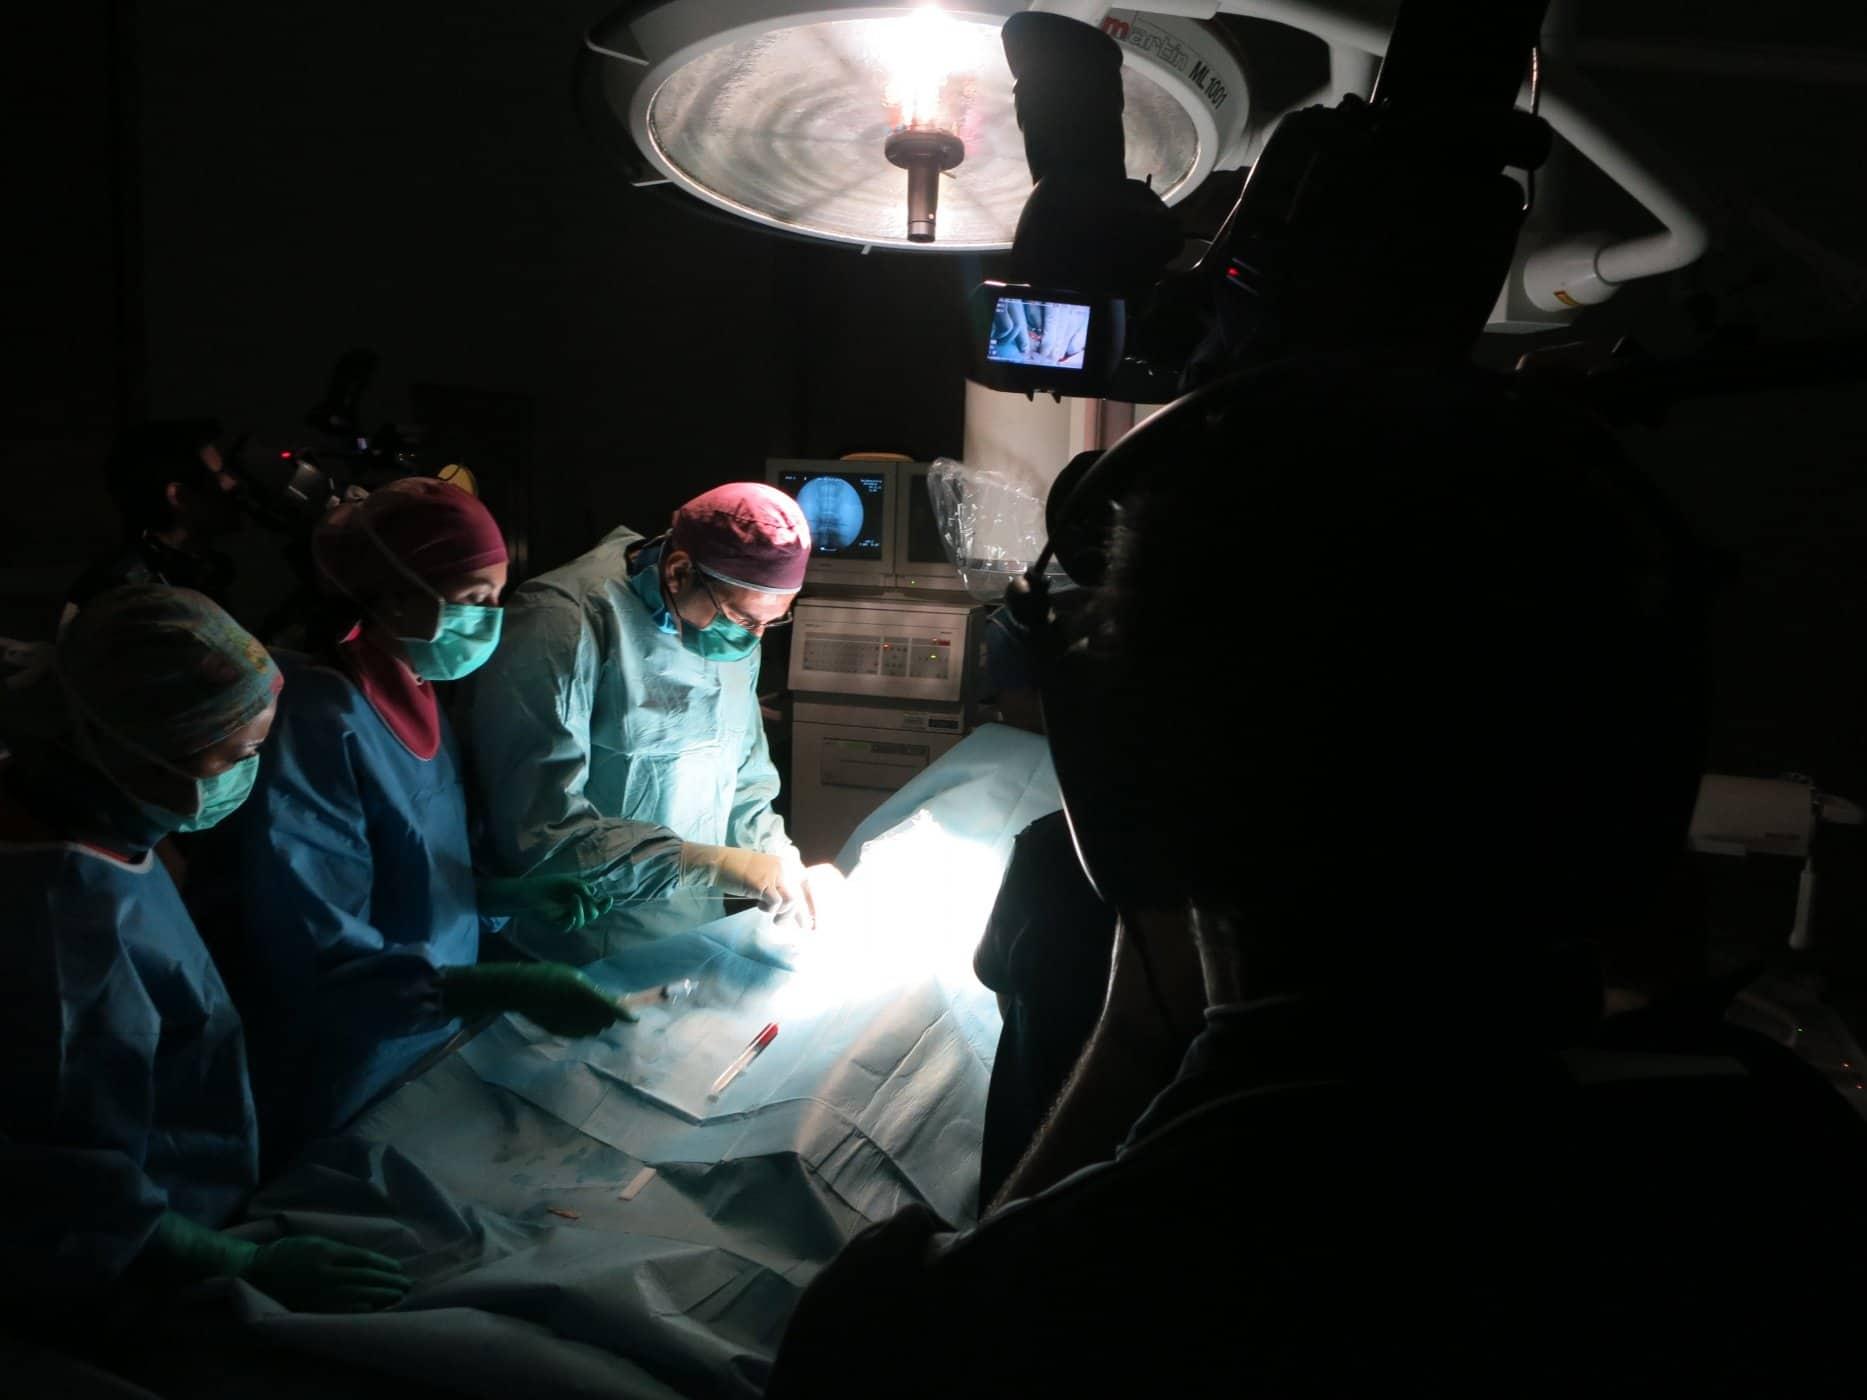 riprese-mediche-interventi-chirurgici-videoproduzione-postproduzione (5)